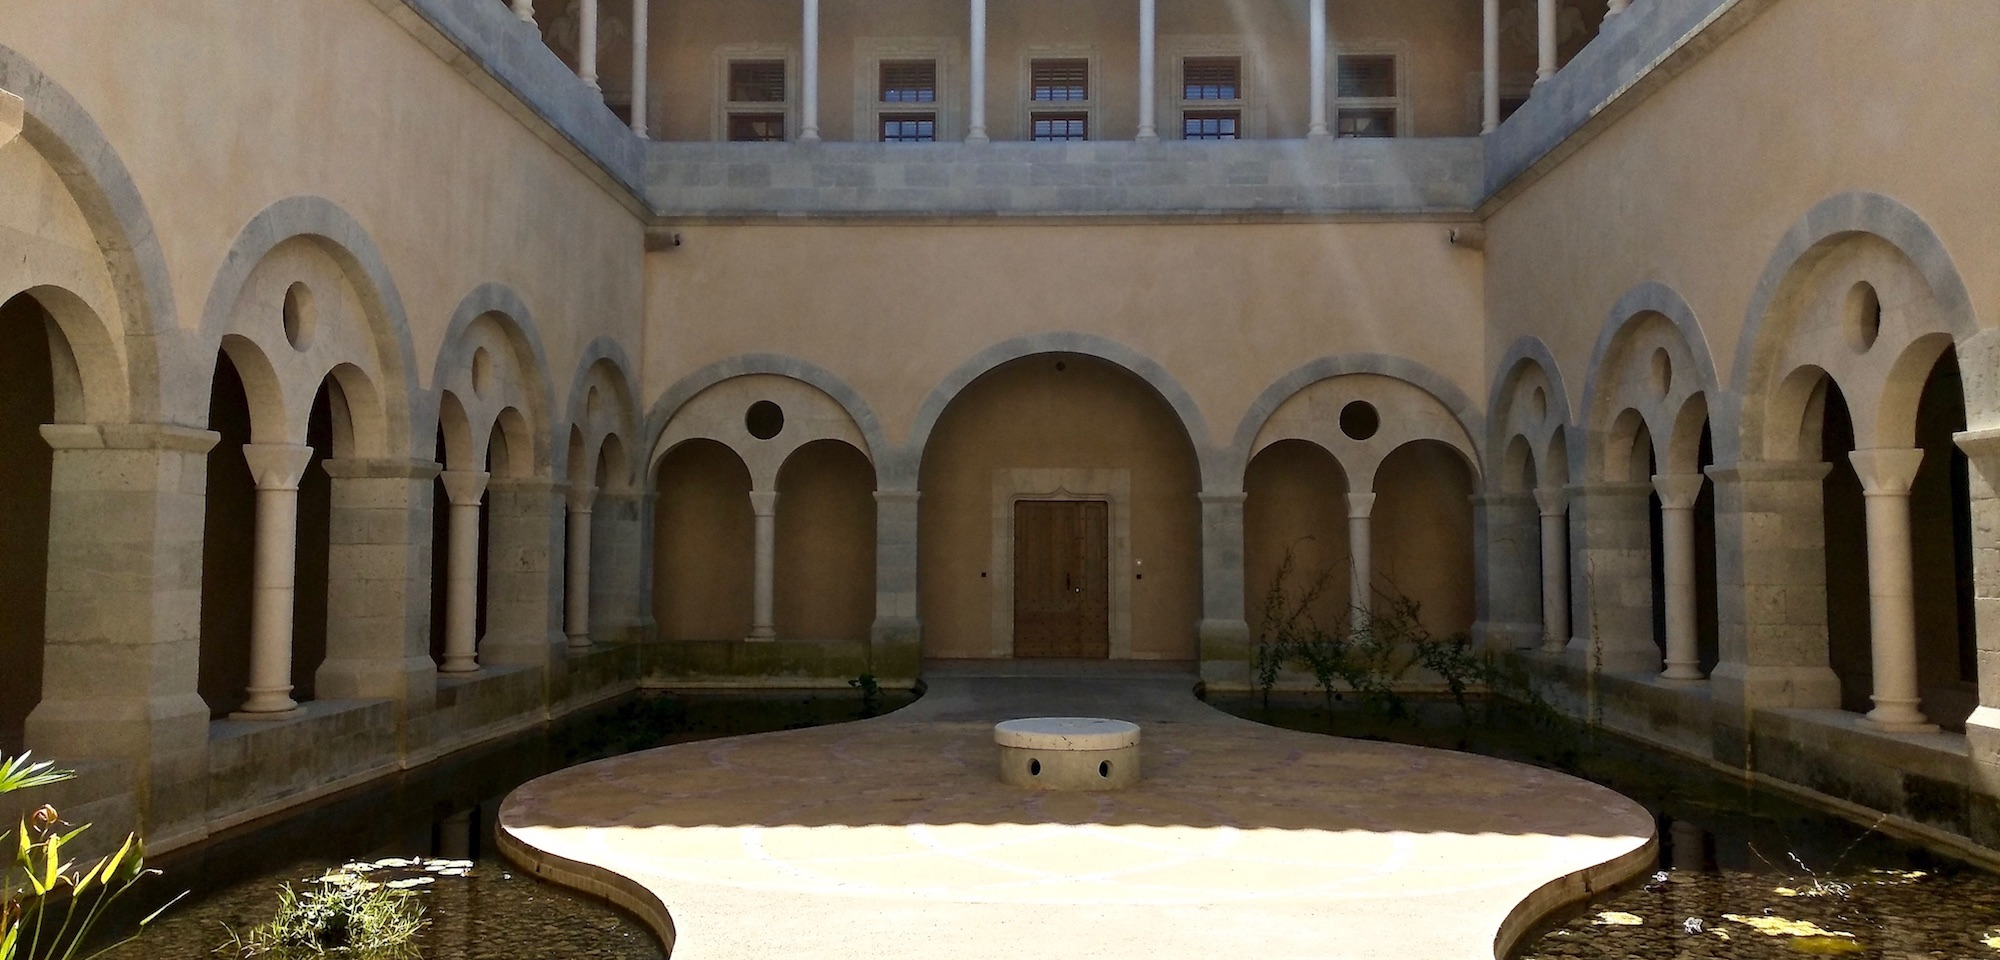 cloître jeune confort luxe 2000x960 - Gers - Château de Guirauton